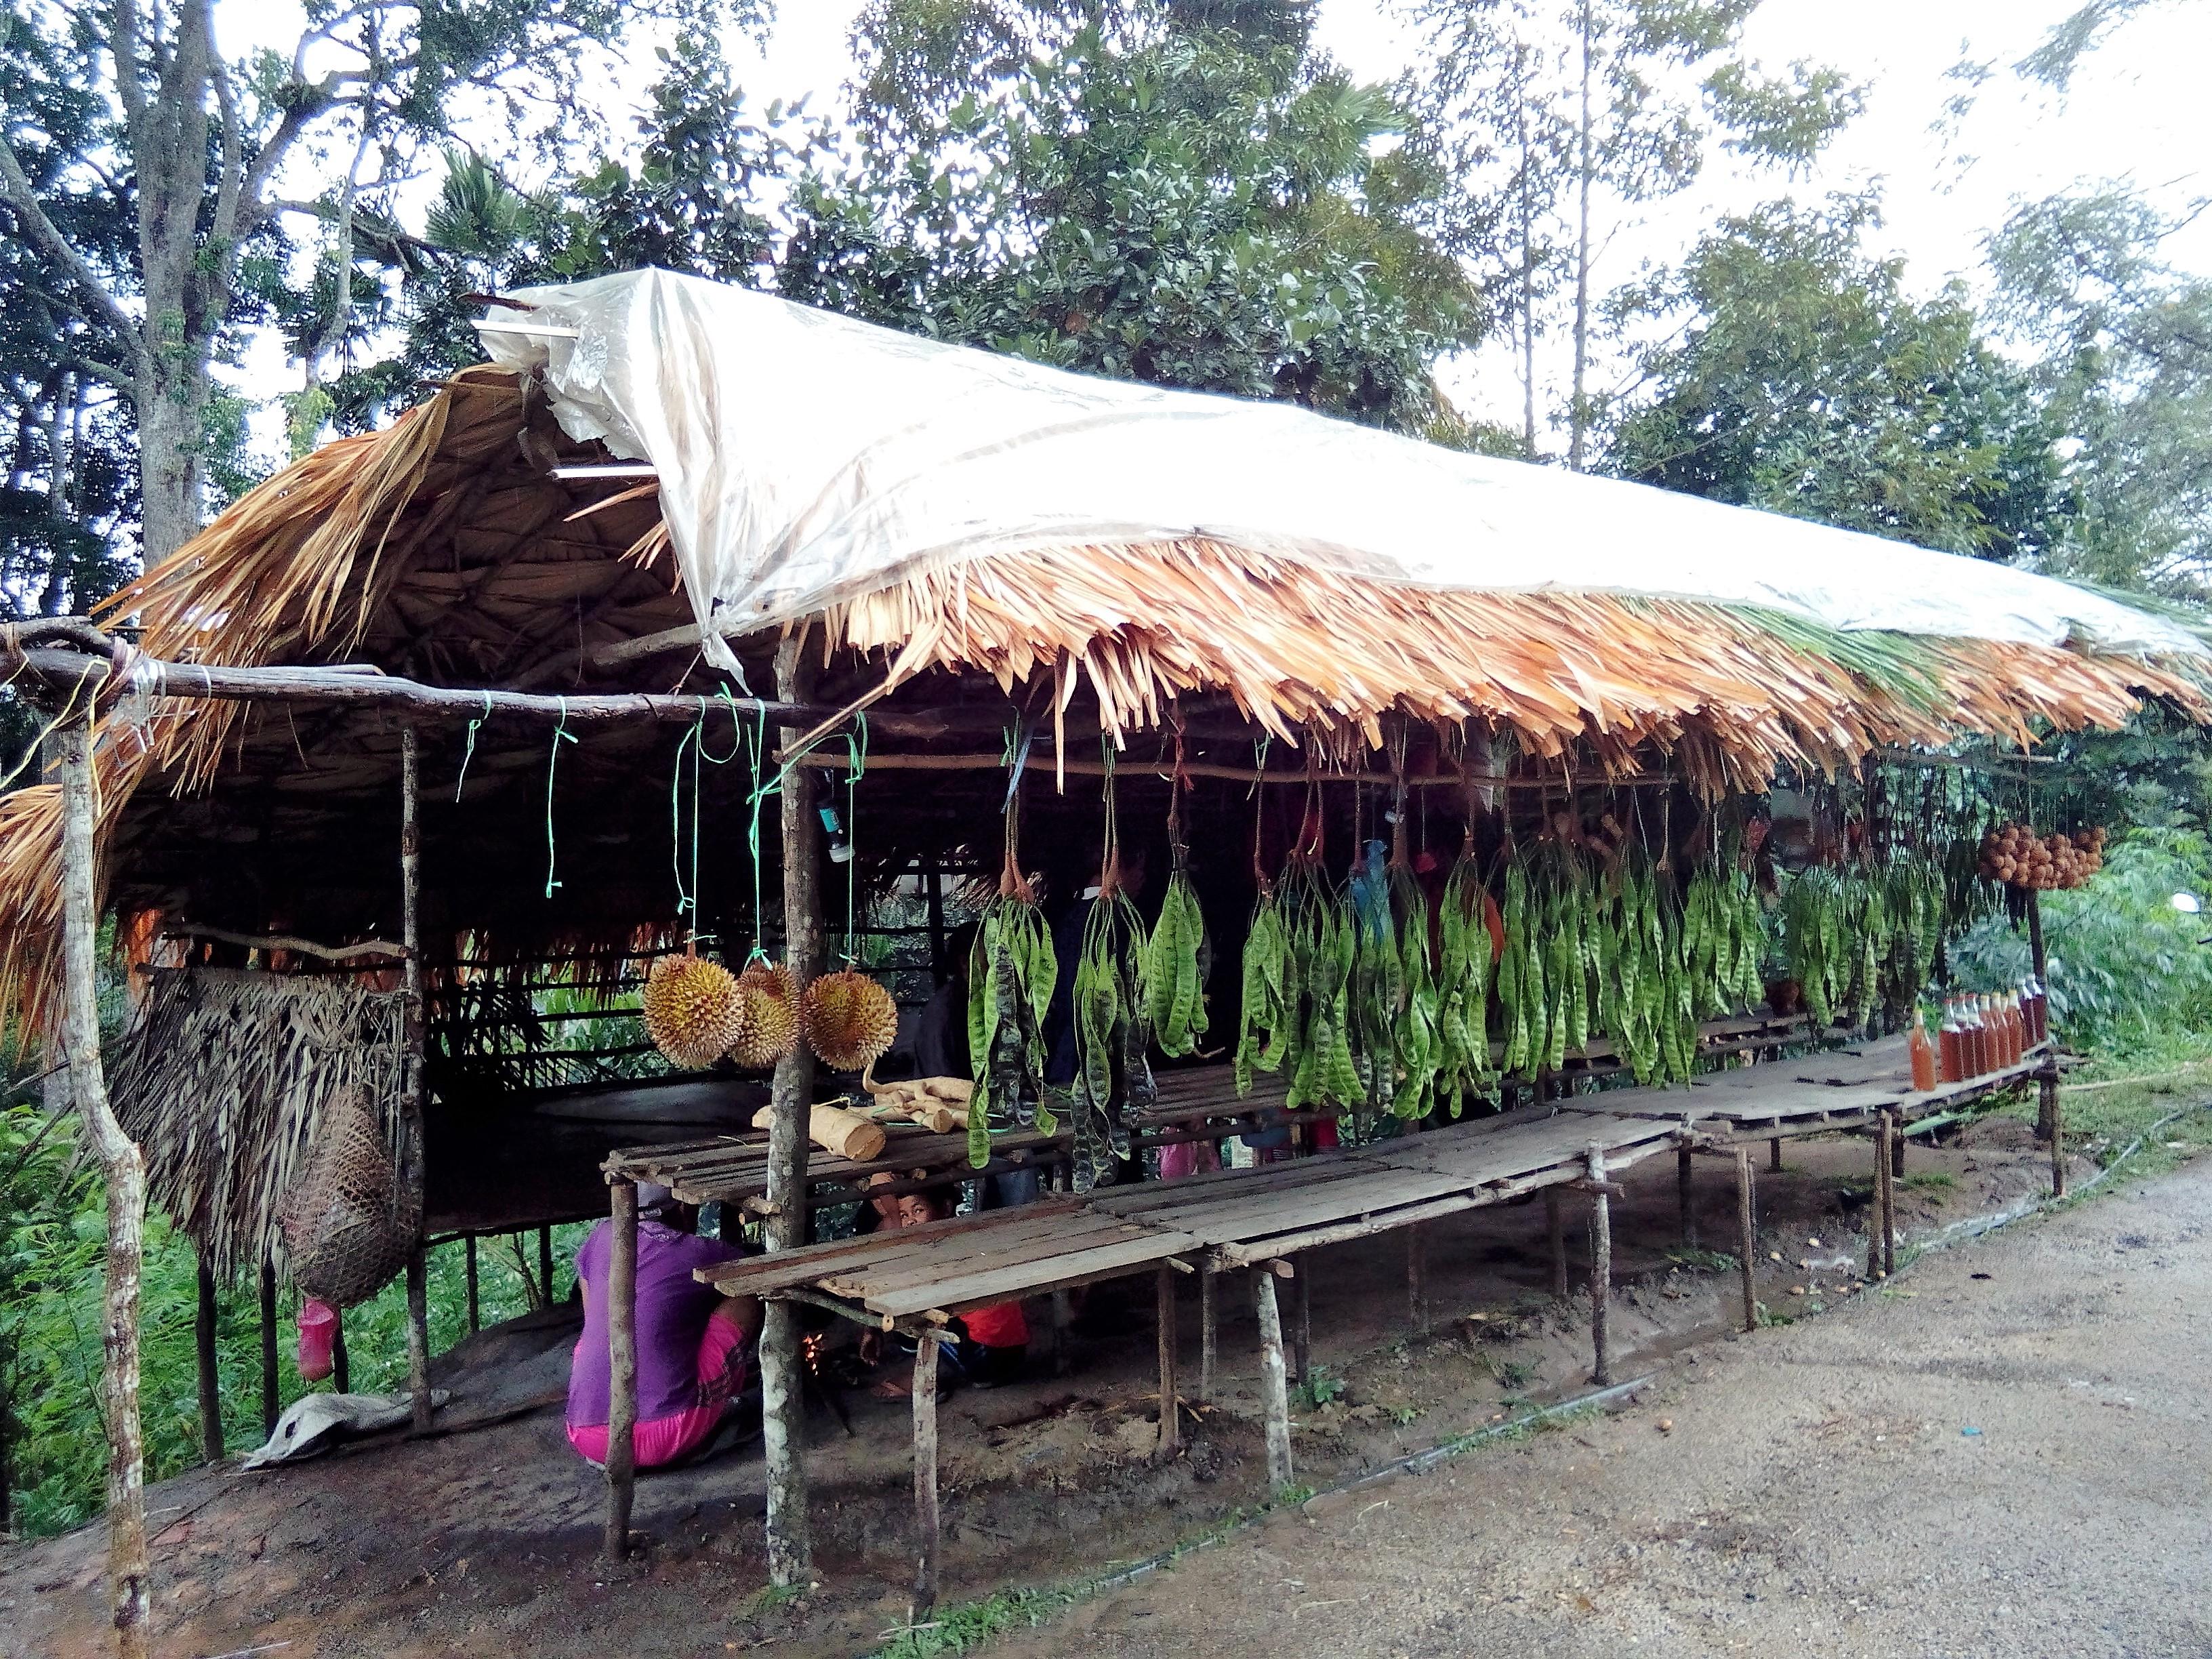 The Orang Asli's Warong